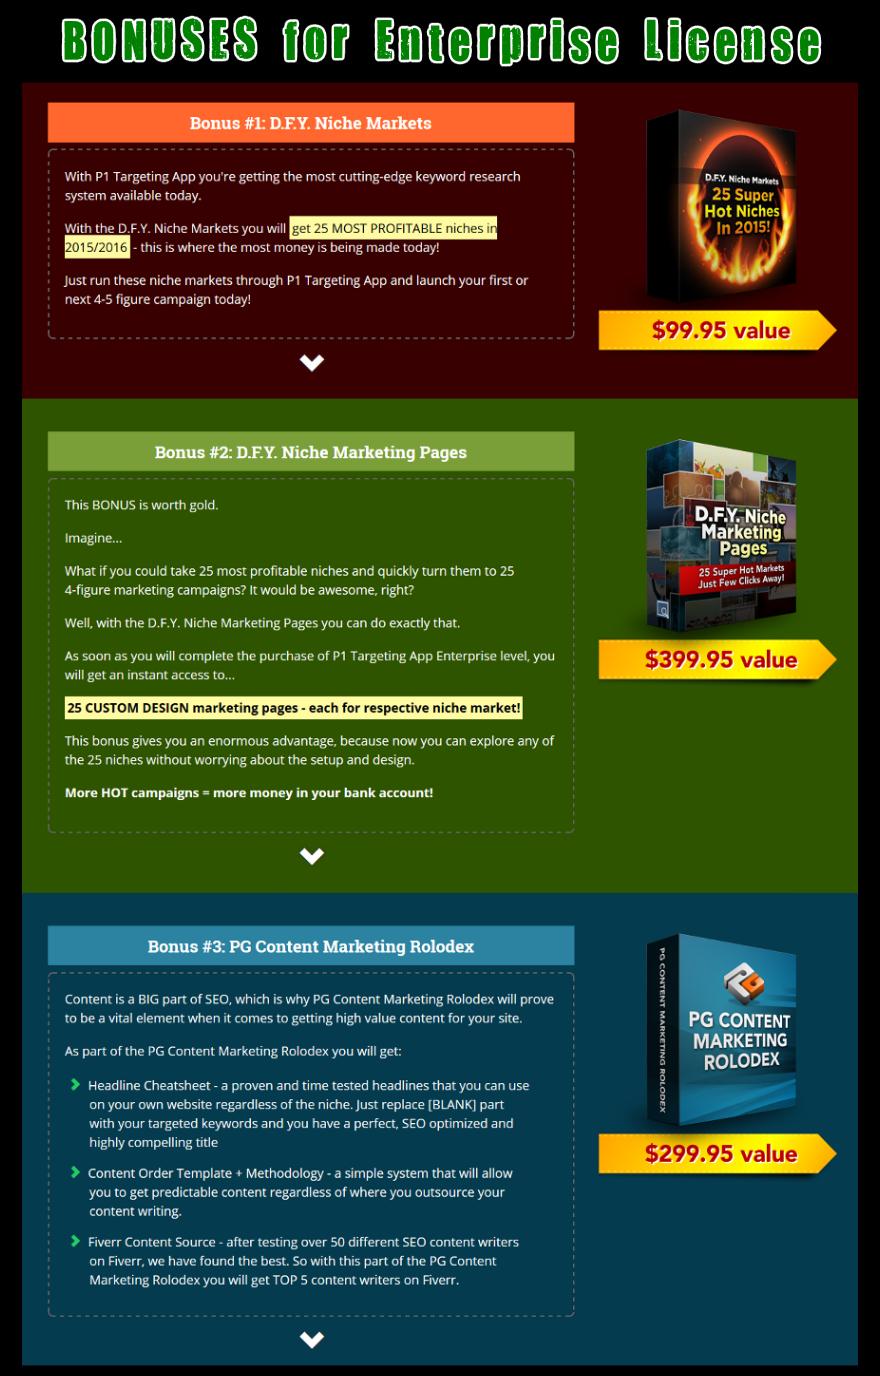 P1 Targeting App Bonuses